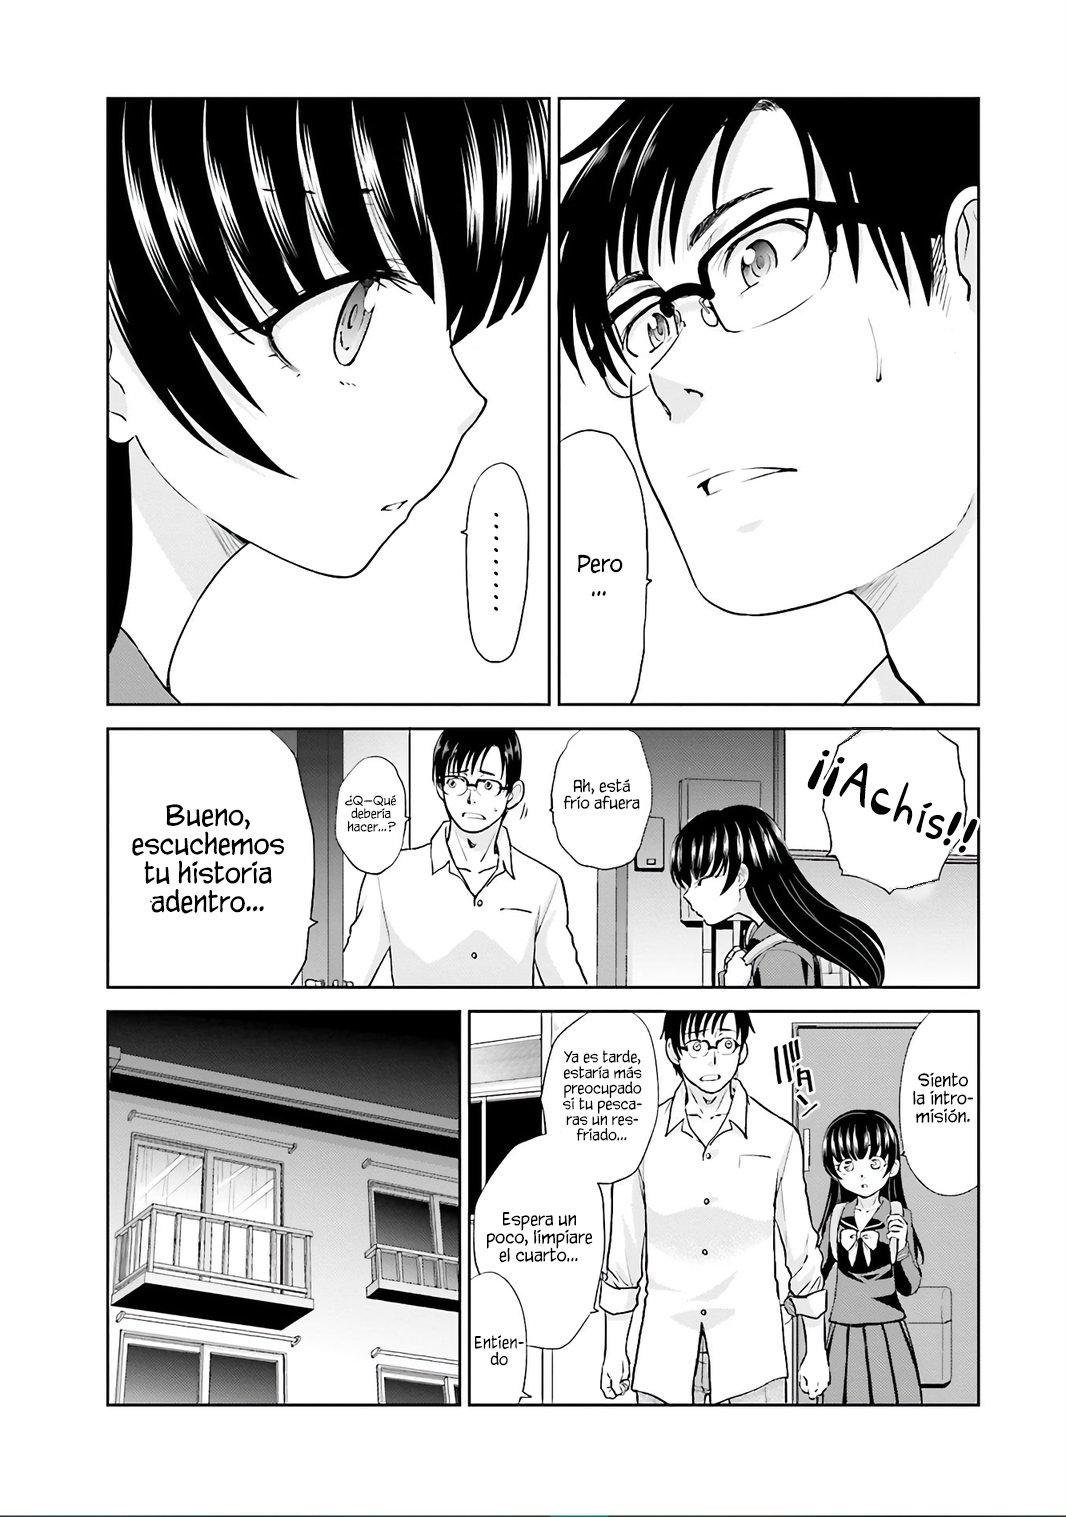 https://nine.mangadogs.com/es_manga/pic8/48/36656/946258/33c1551e32887aef85c6007466e667a0.jpg Page 12